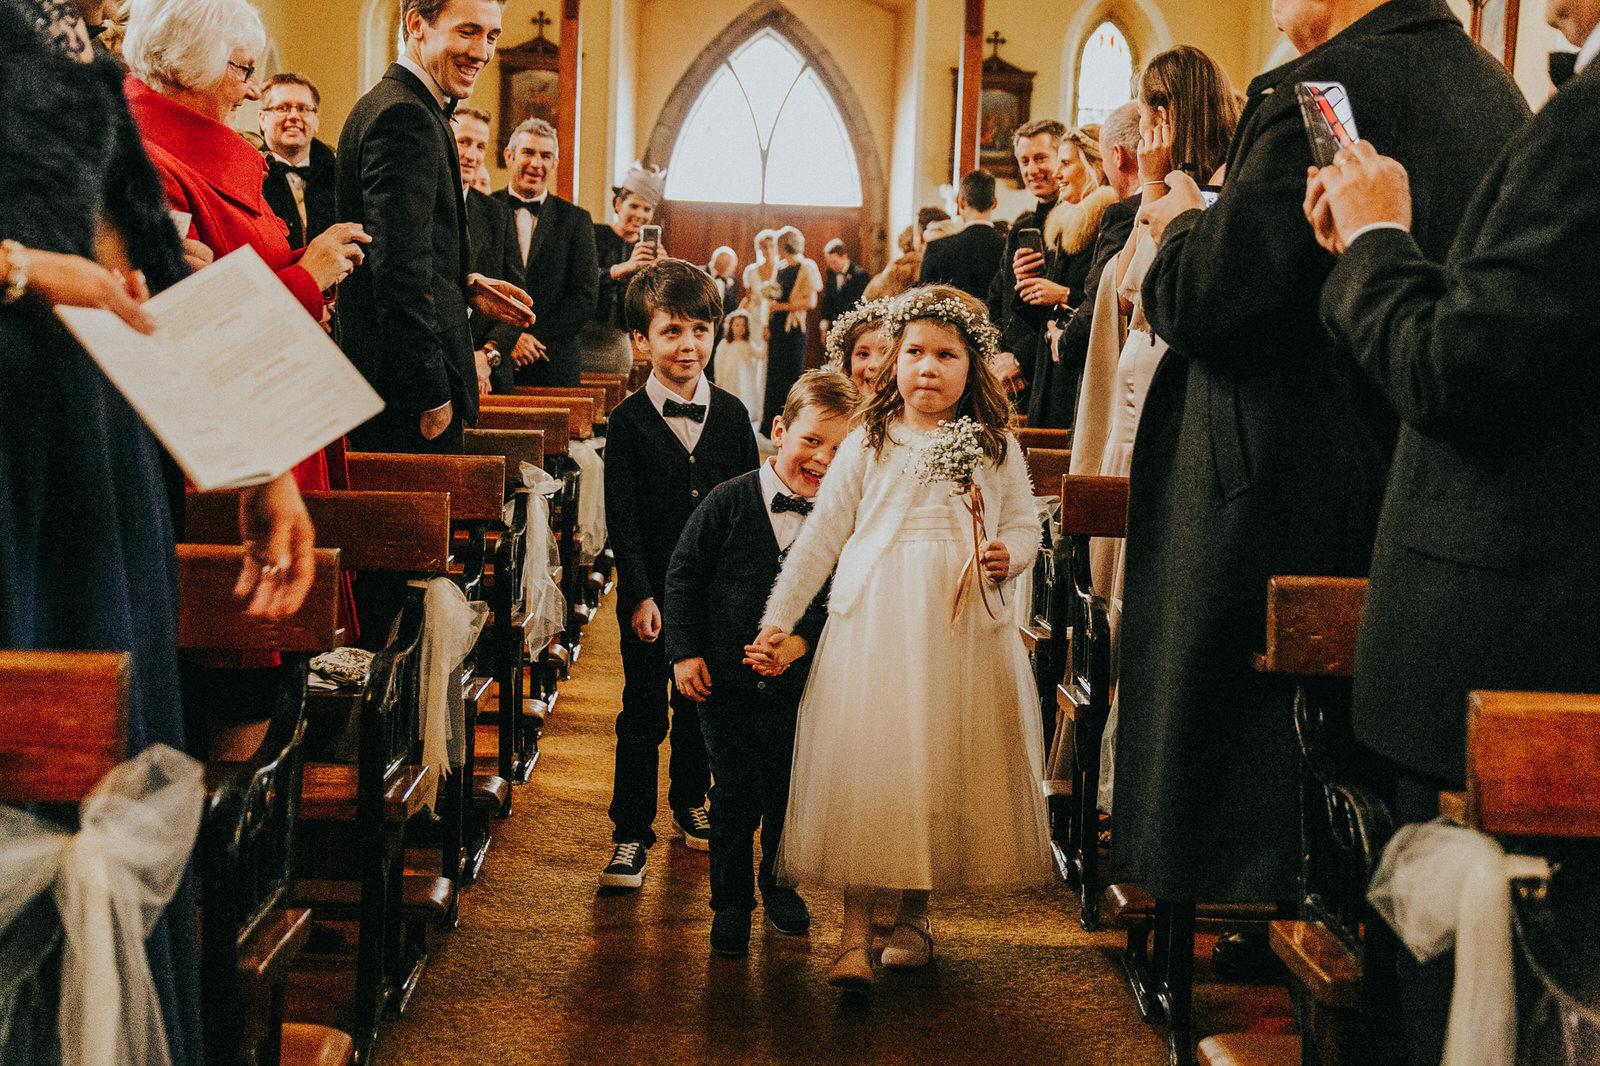 Dunbrody_House_Wedding_photographer_068.jpg